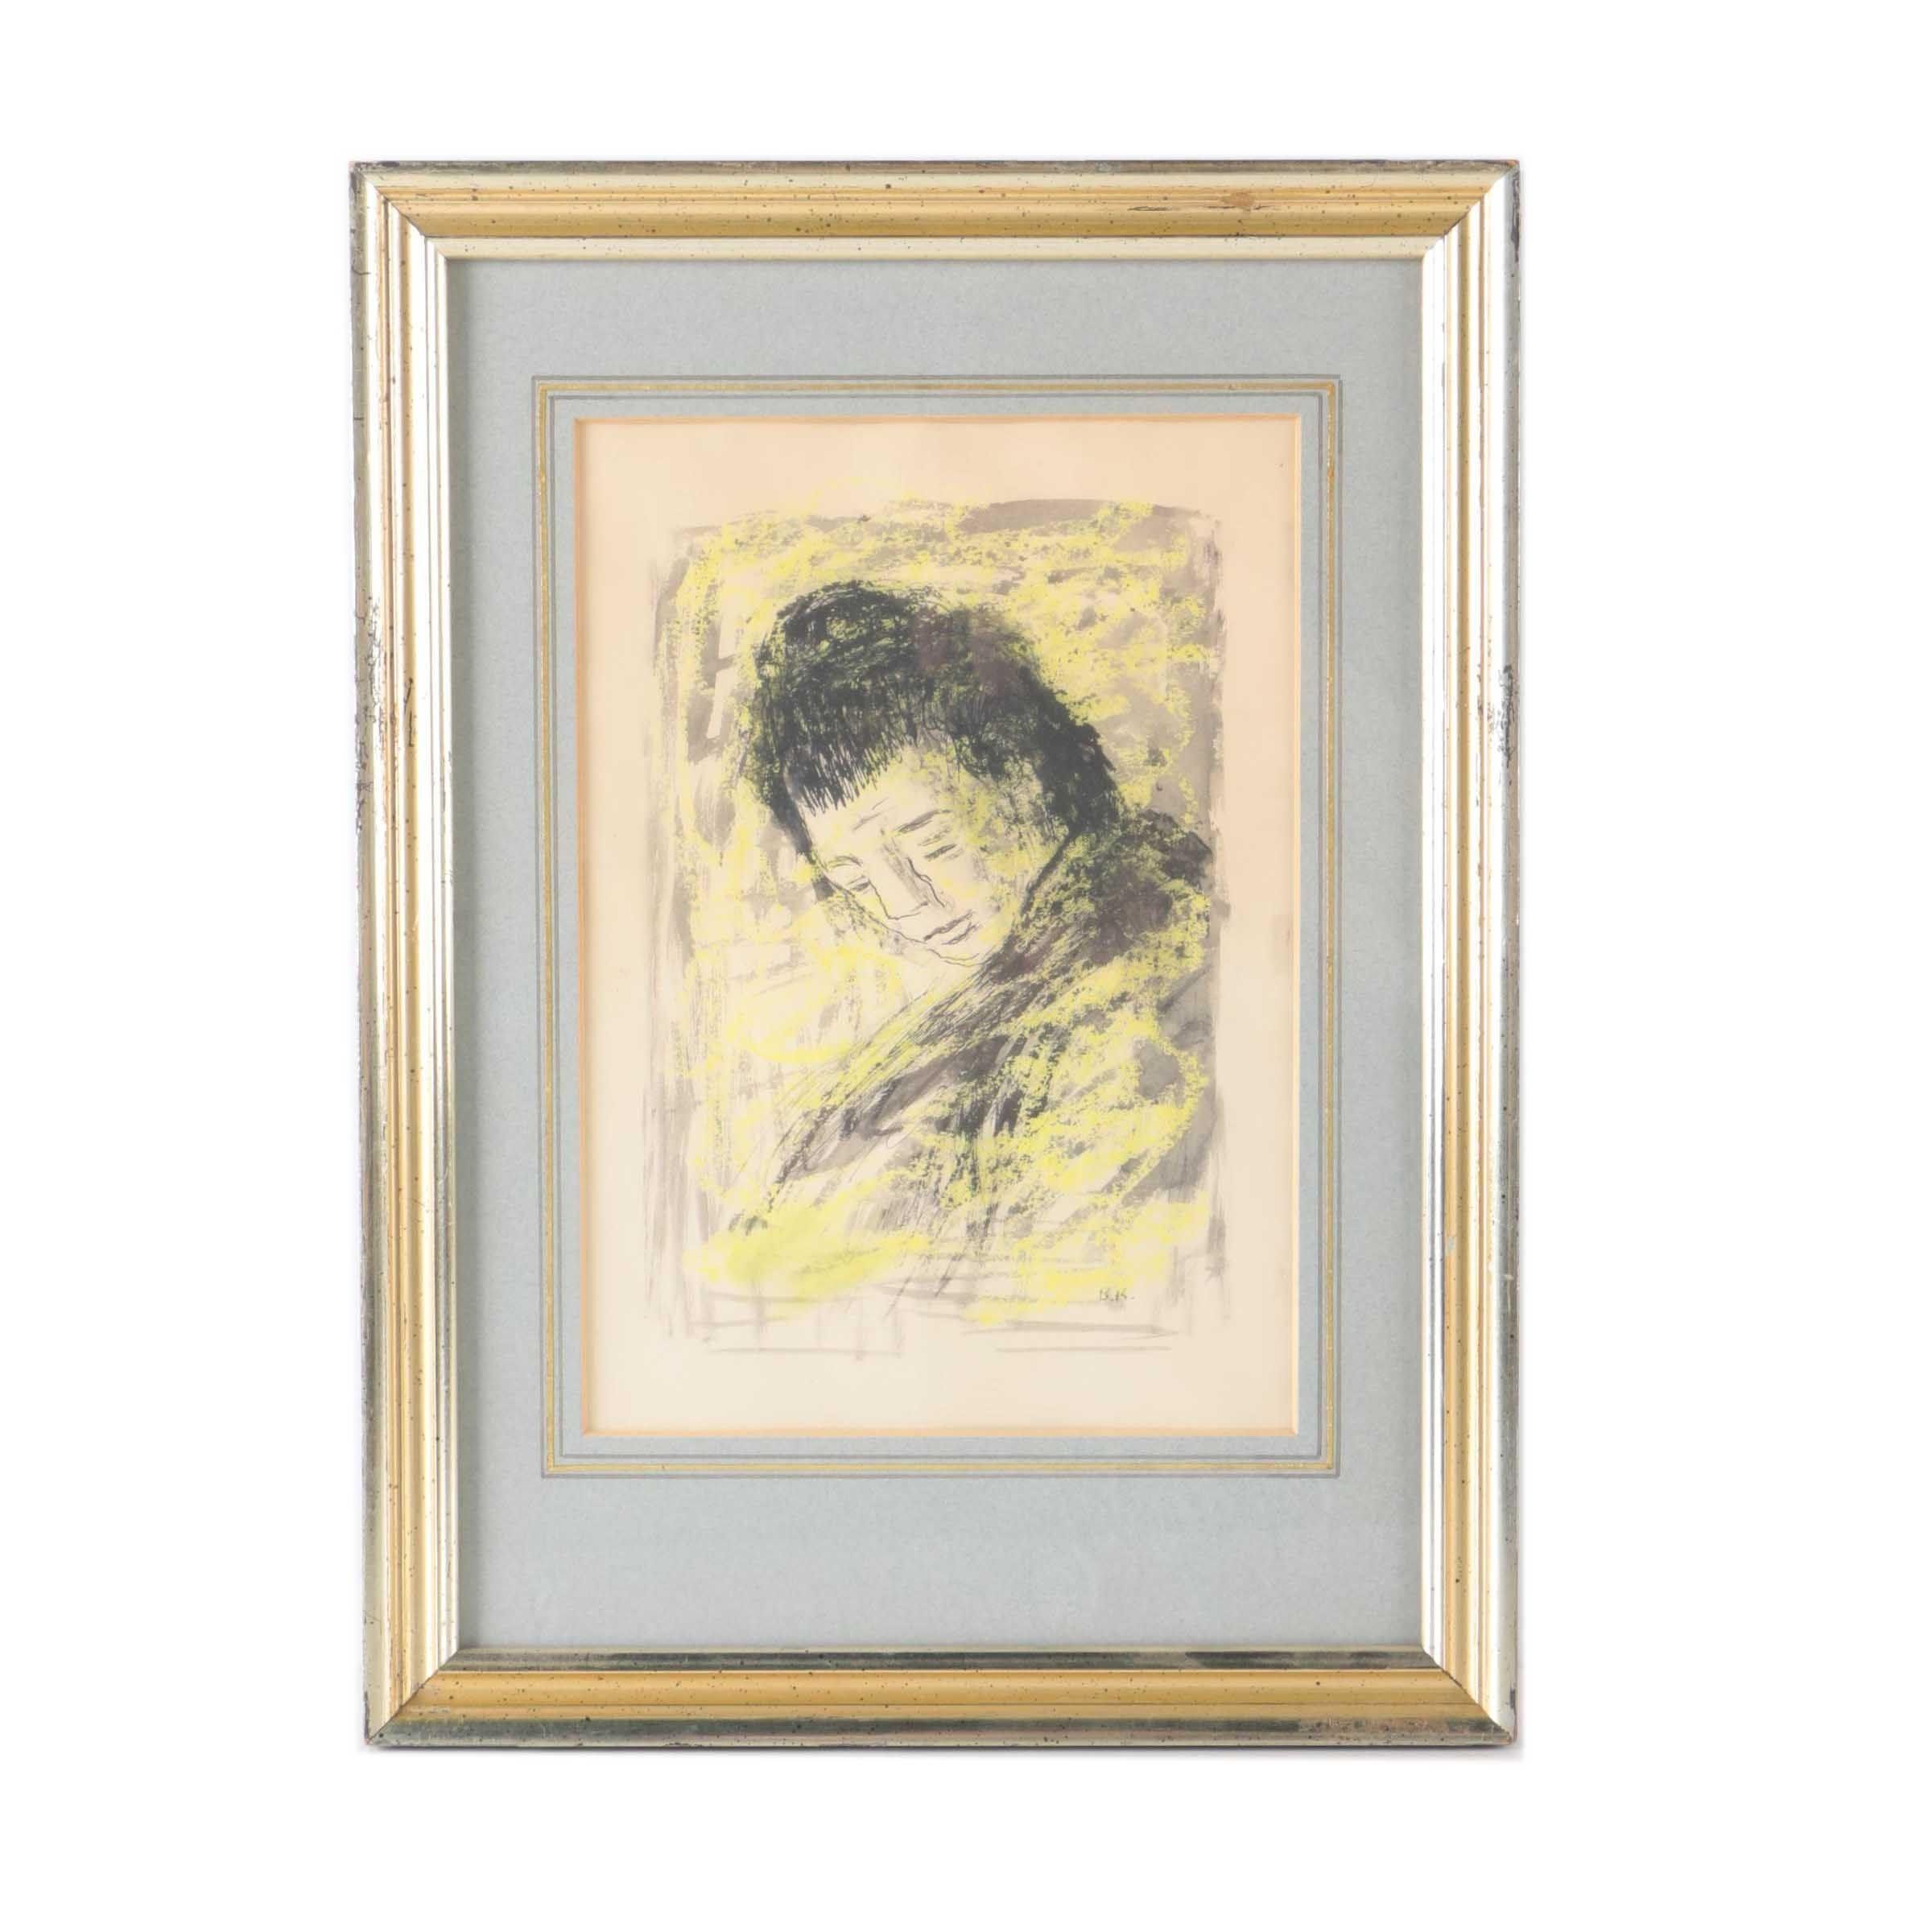 Benjamin Kopman Watercolor and Ink Portraiture Painting